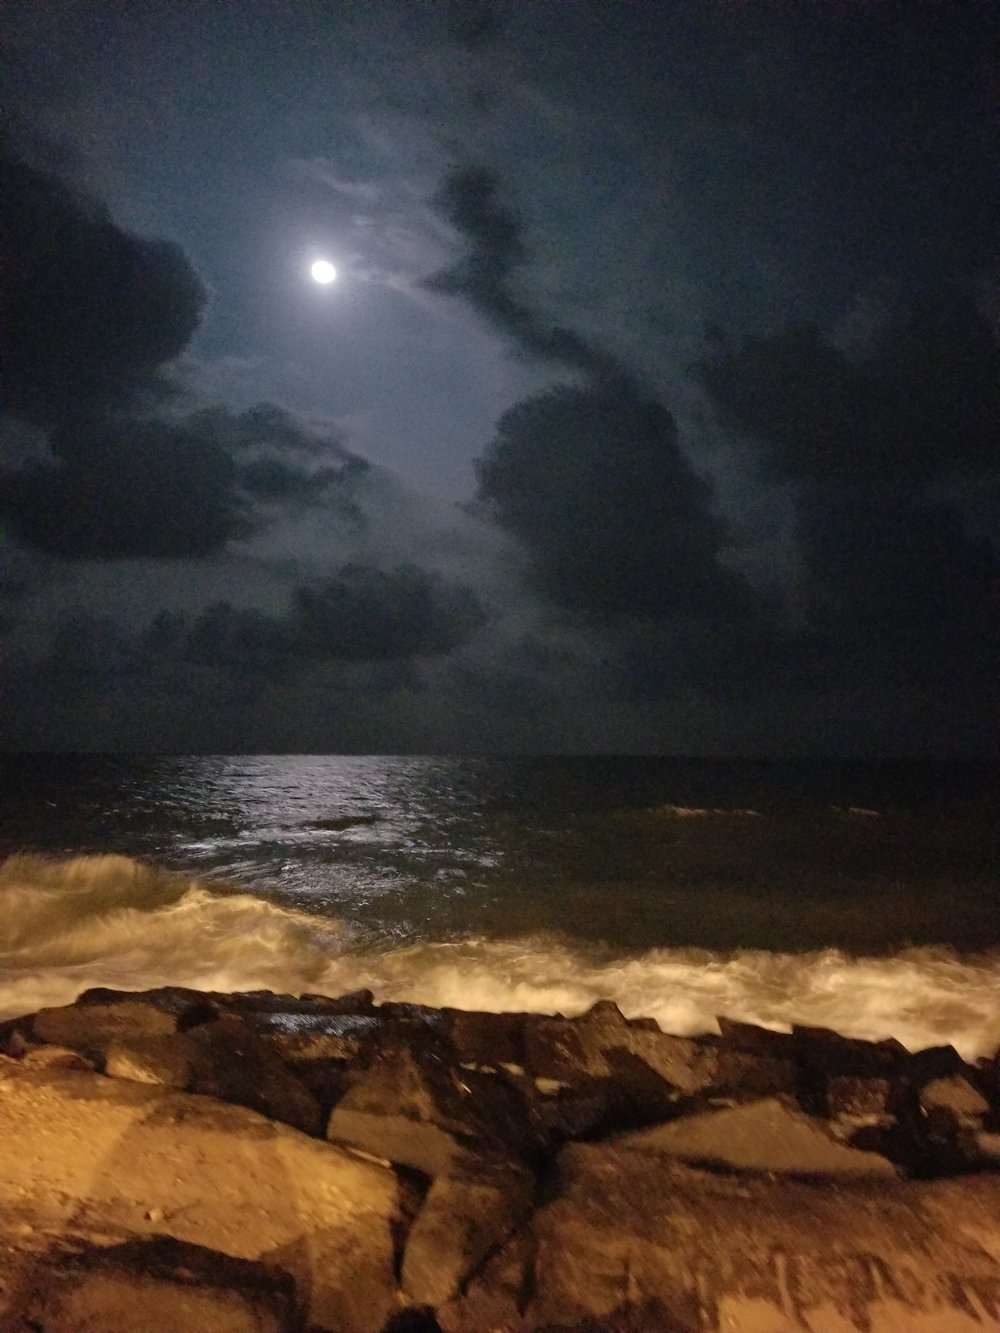 moon over Pondy